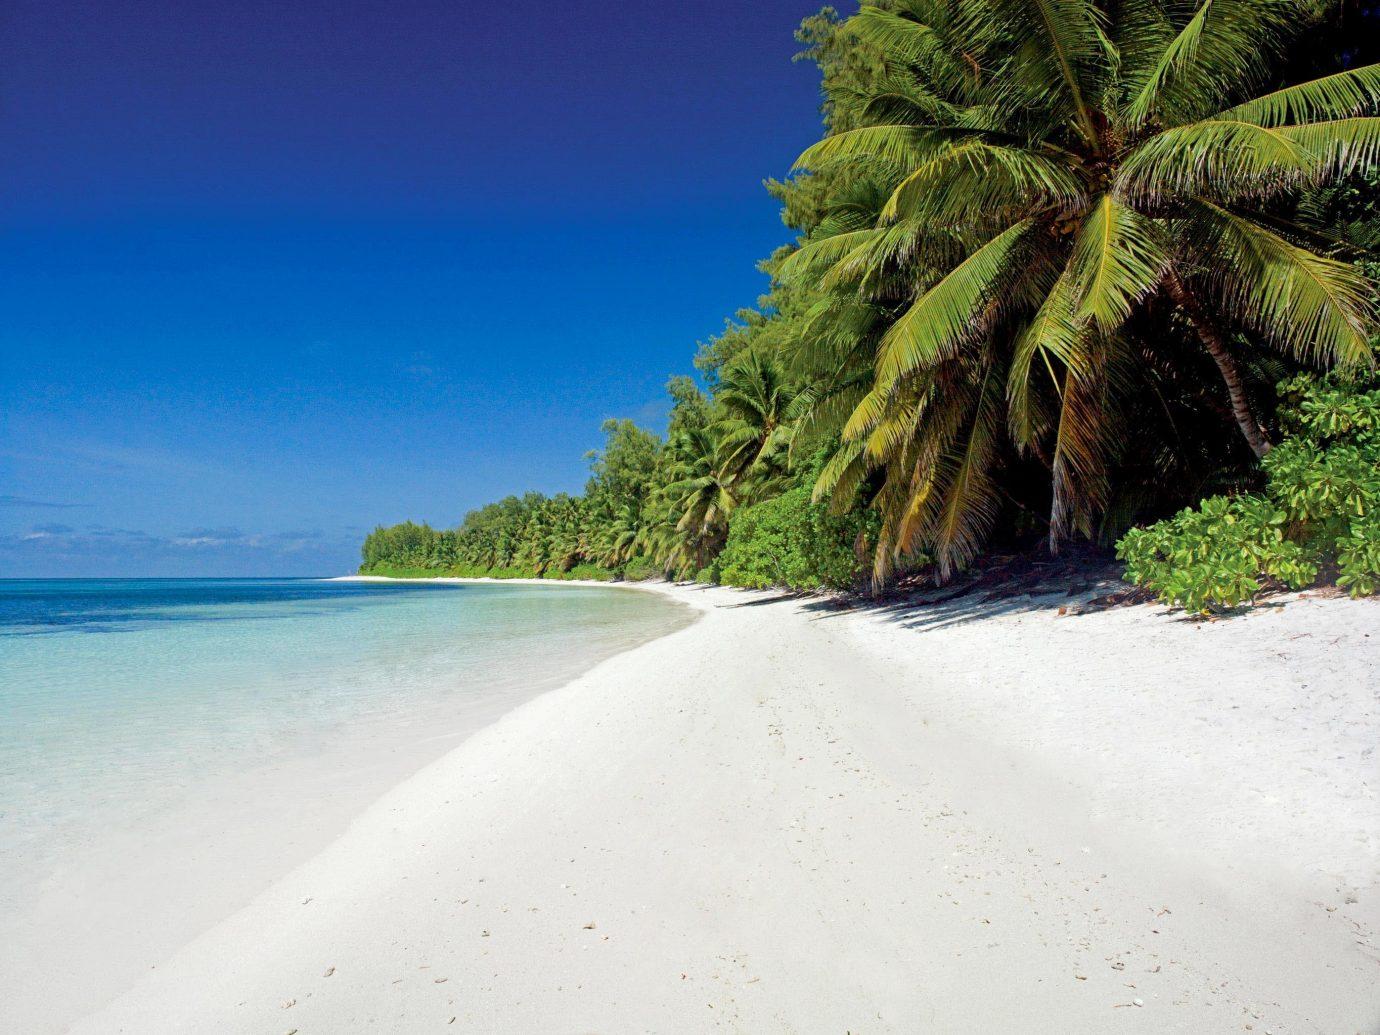 Secret Getaways Trip Ideas outdoor water Beach Nature landform tree body of water Coast Sea shore Ocean vacation tropics bay arecales Island sand